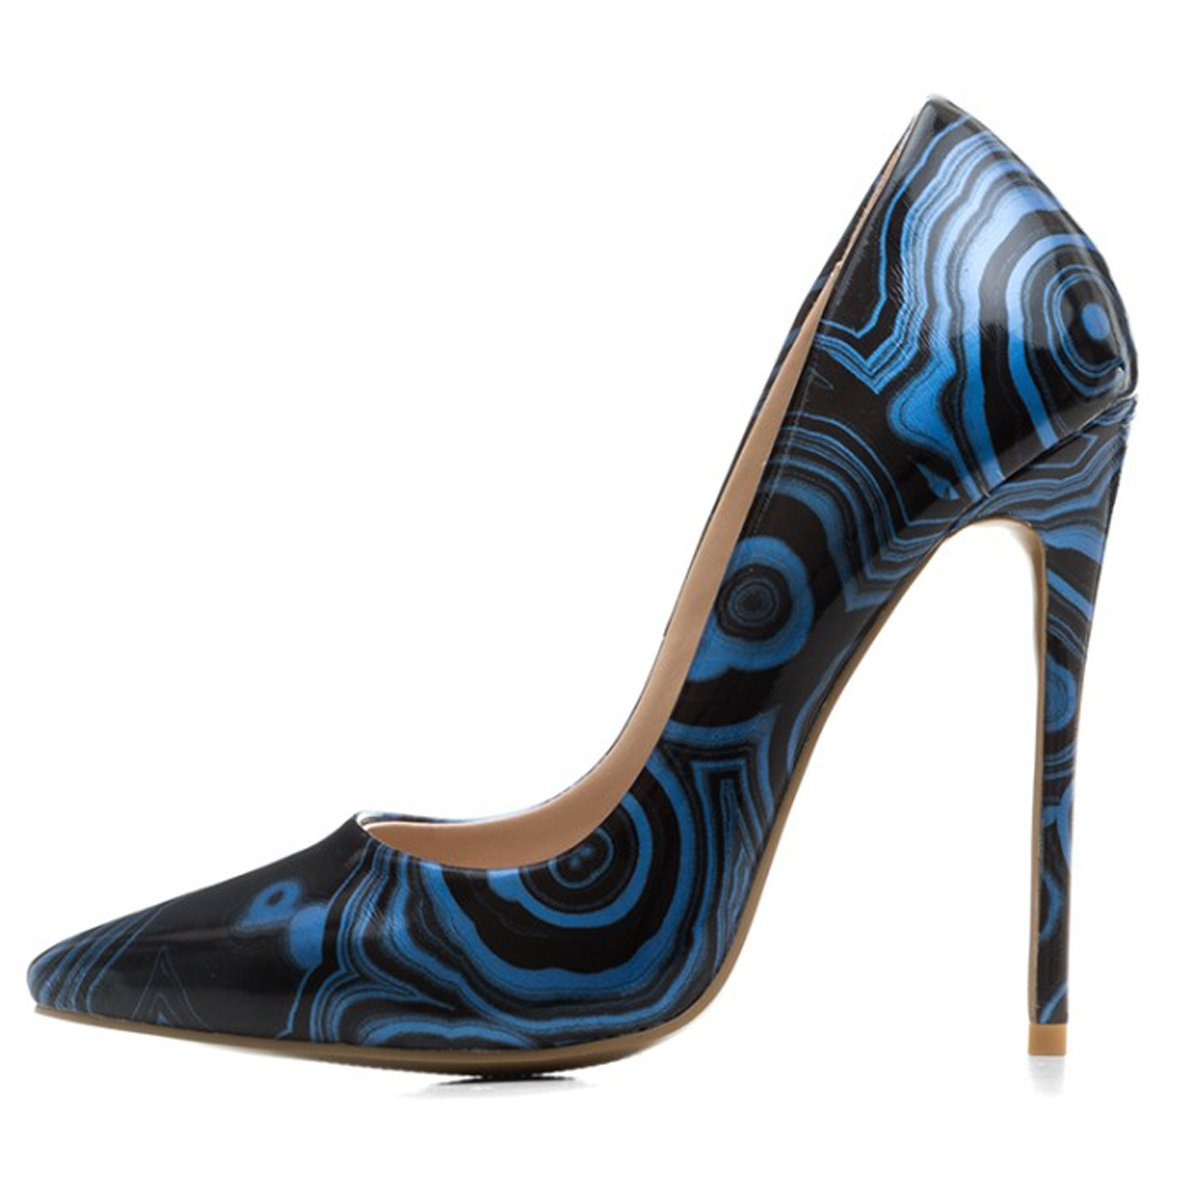 Chris-T Womens Formal Pointed Toe Pumps Basic Shoes High Heel Stilettos Sexy Slip On Dress Shoes Size 4-15 US B07DCM9MGS 11 B(M) US|Blue Patternt/Red B0tt*m